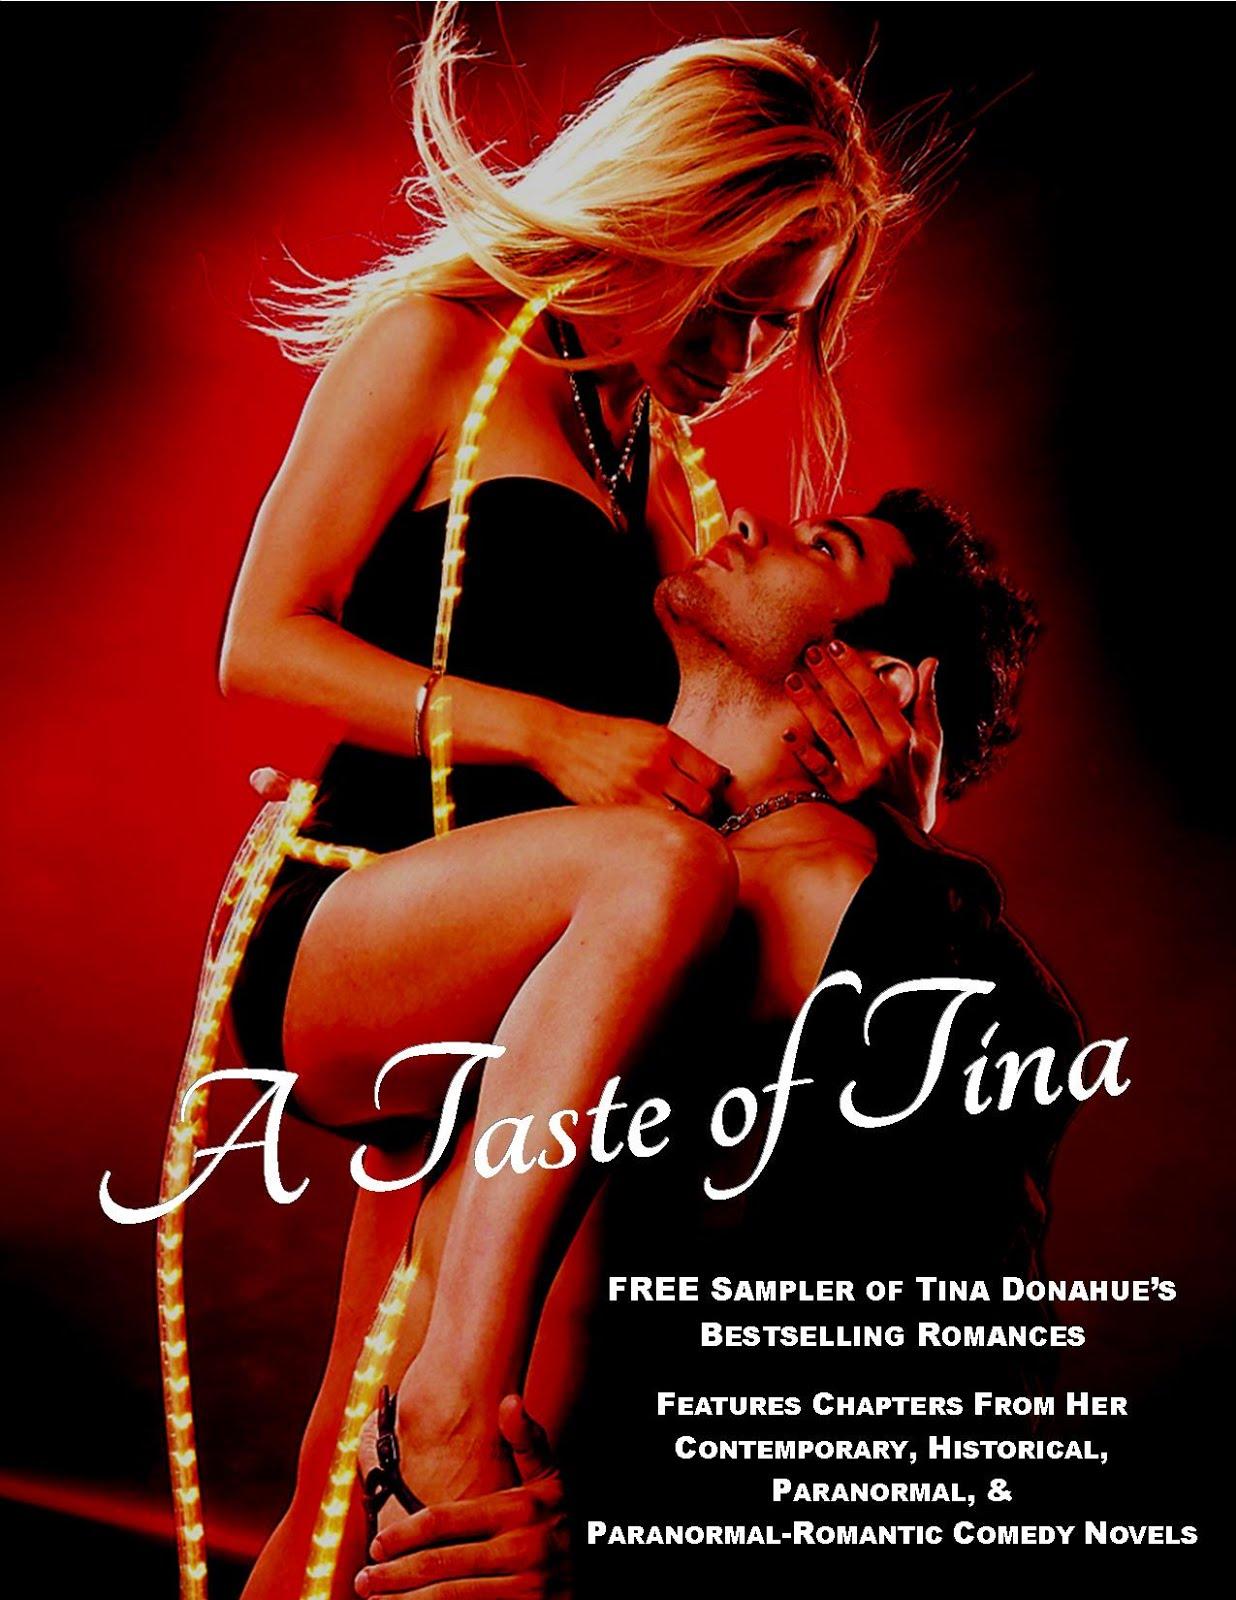 A Taste of Tina